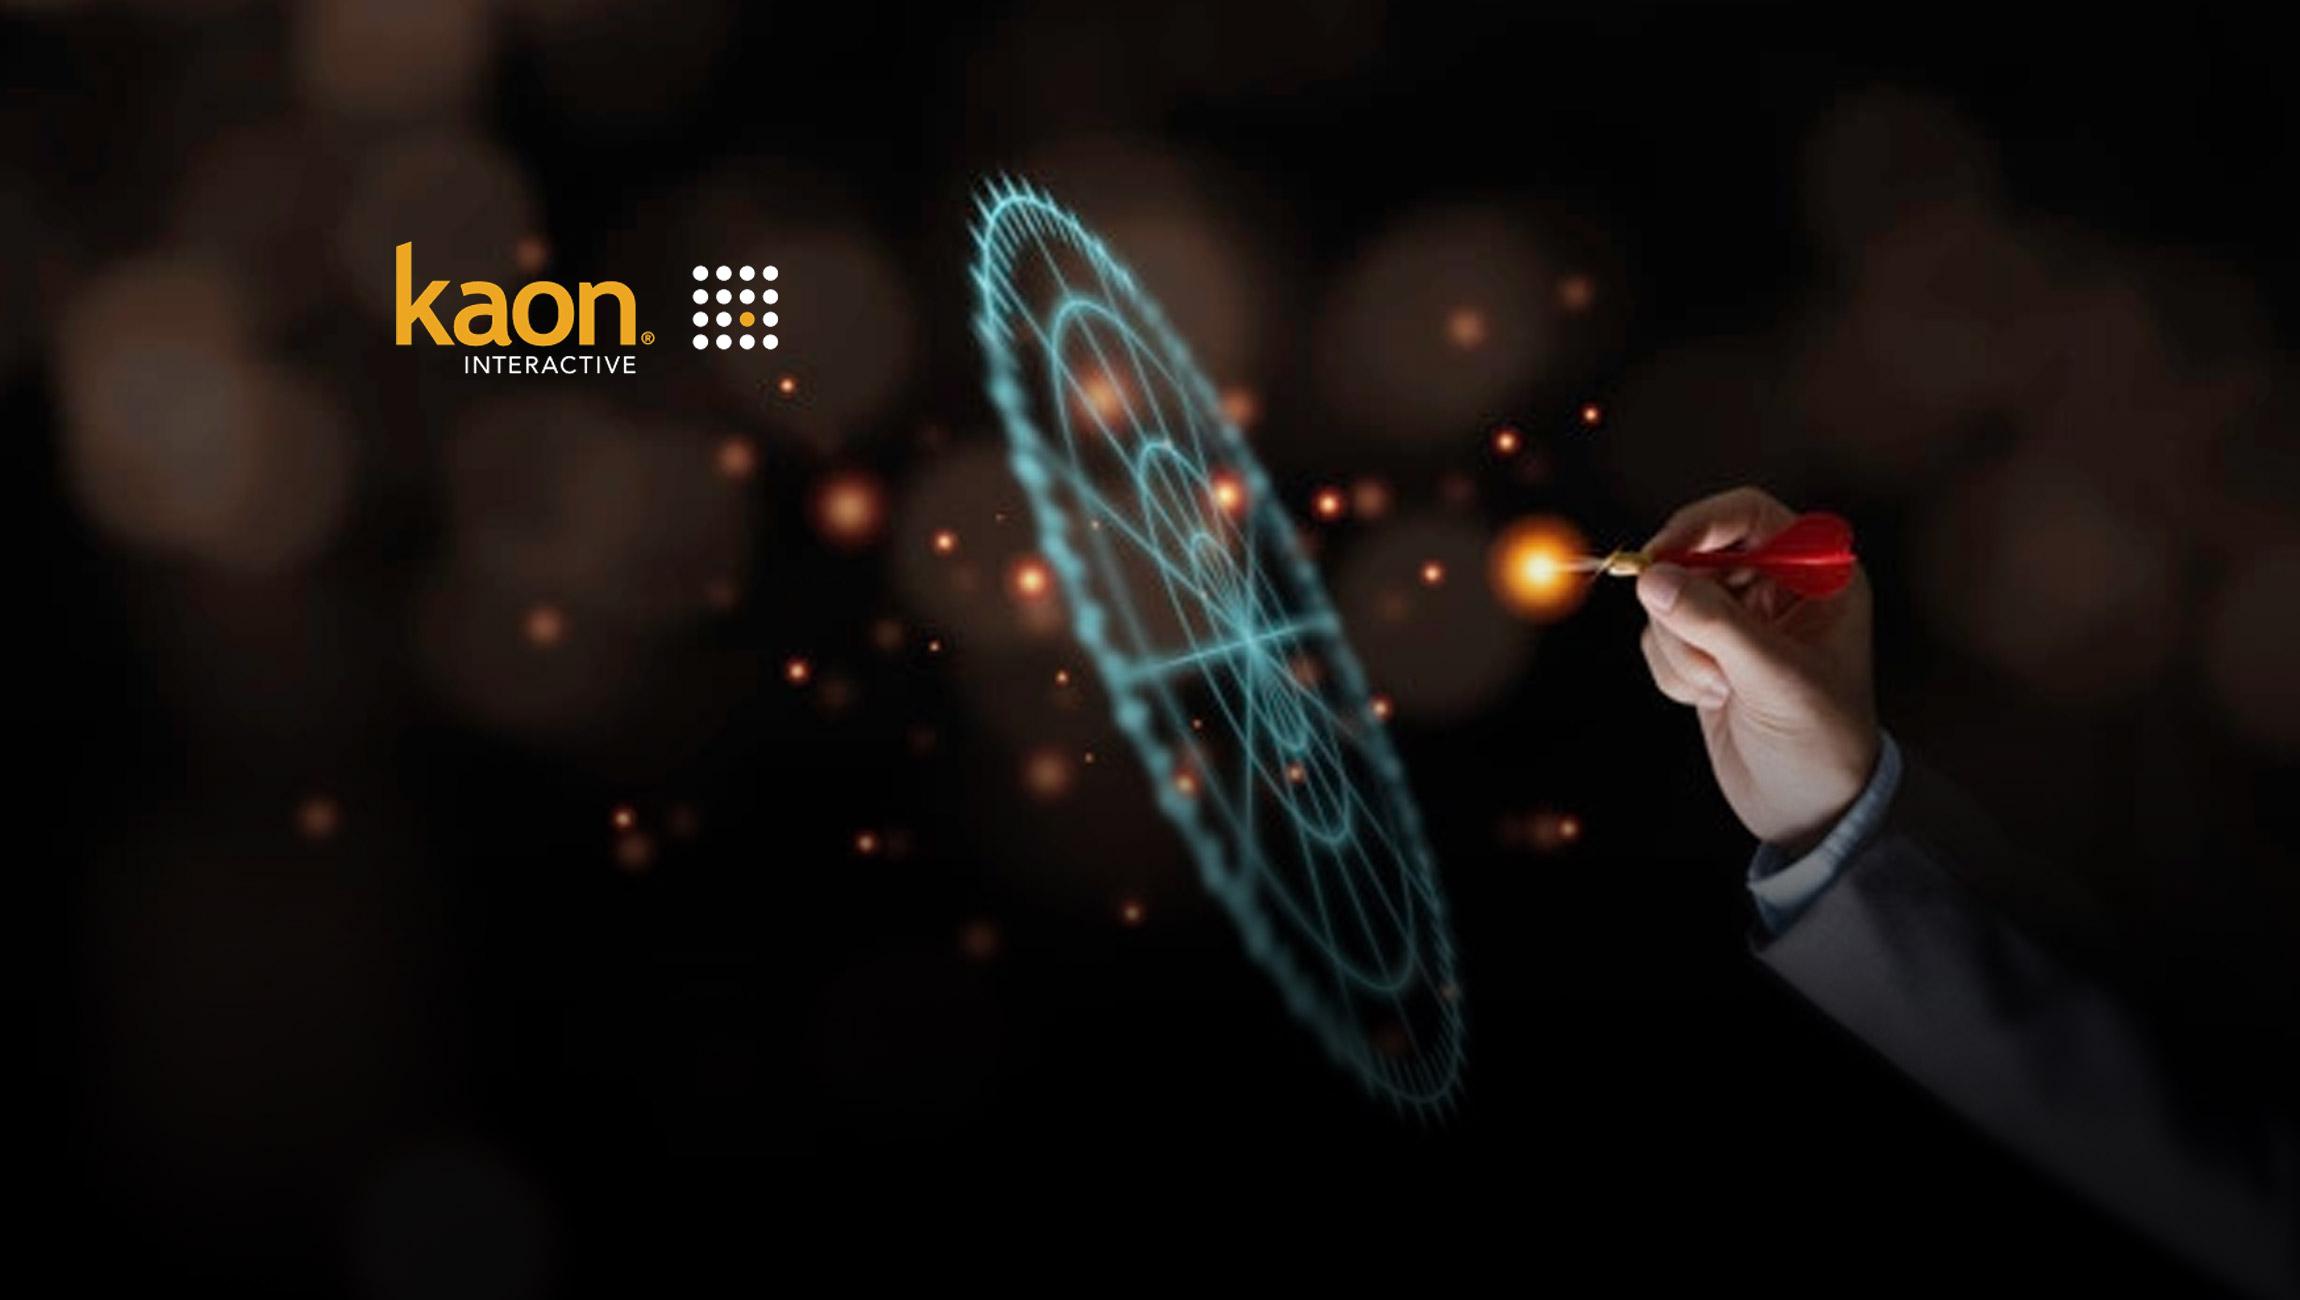 Kaon Interactive Revolutionizes Digital Sales and Marketing in 2020